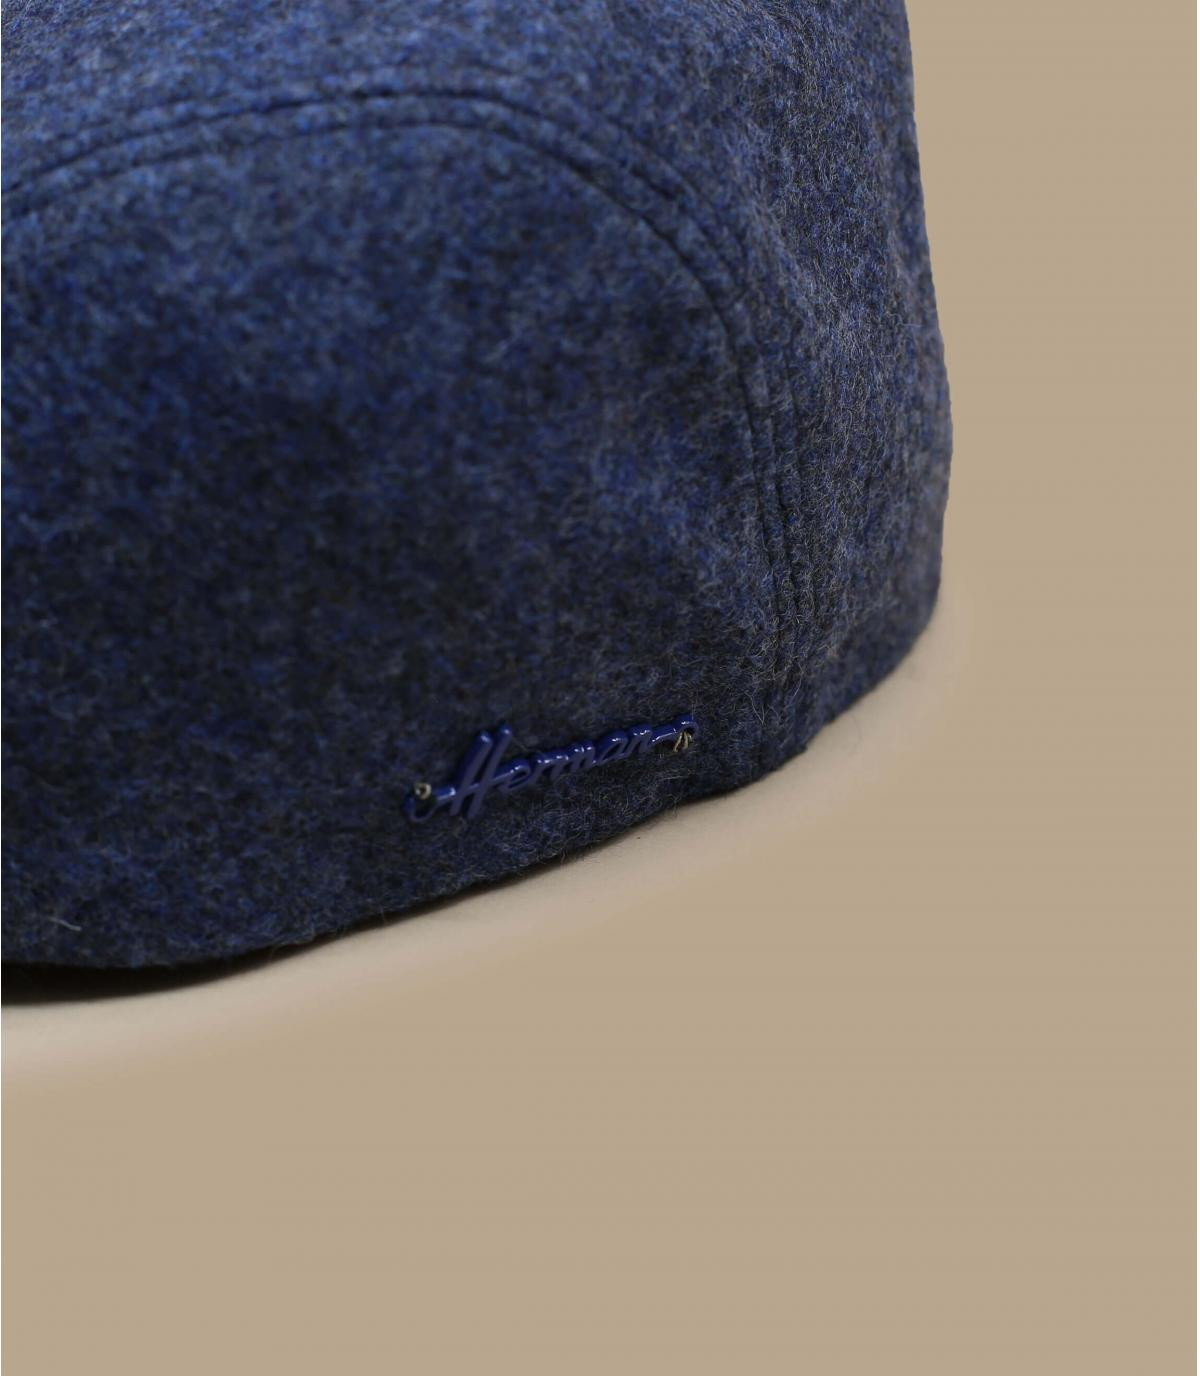 Dettagli Range wool EF blue - image 2